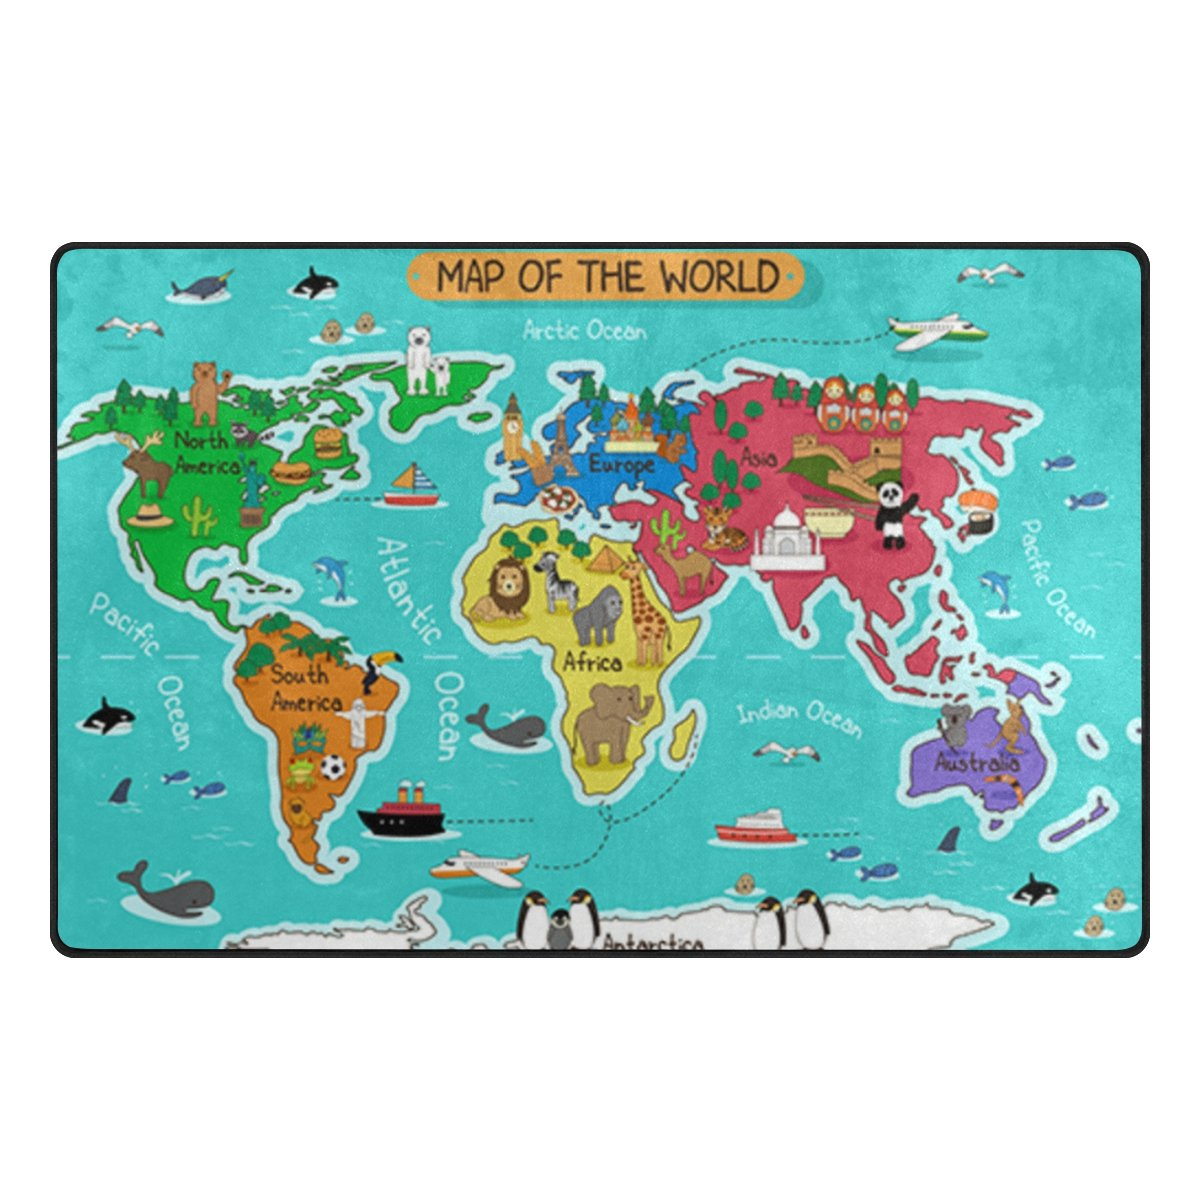 Cooper girl Animal Map of The World Area Rug Lightweight 60x39 Inches Indoor Outdoor Decorative Floor Rug for Children Play